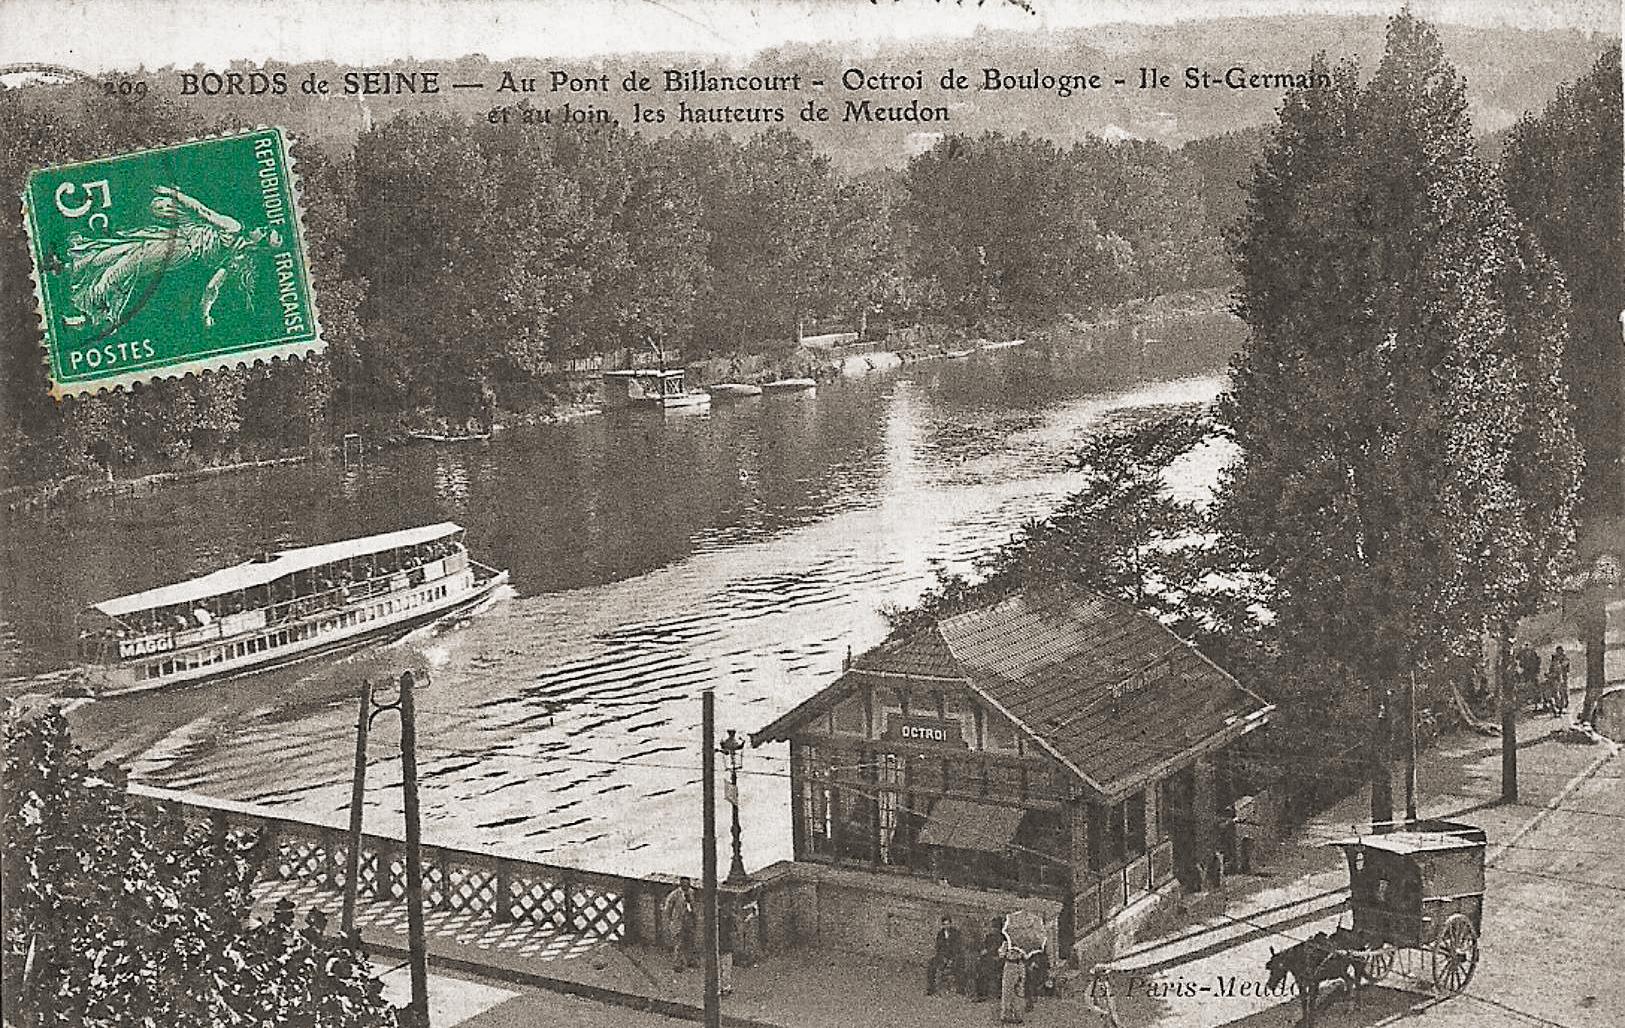 Pont de Billancourt octroi